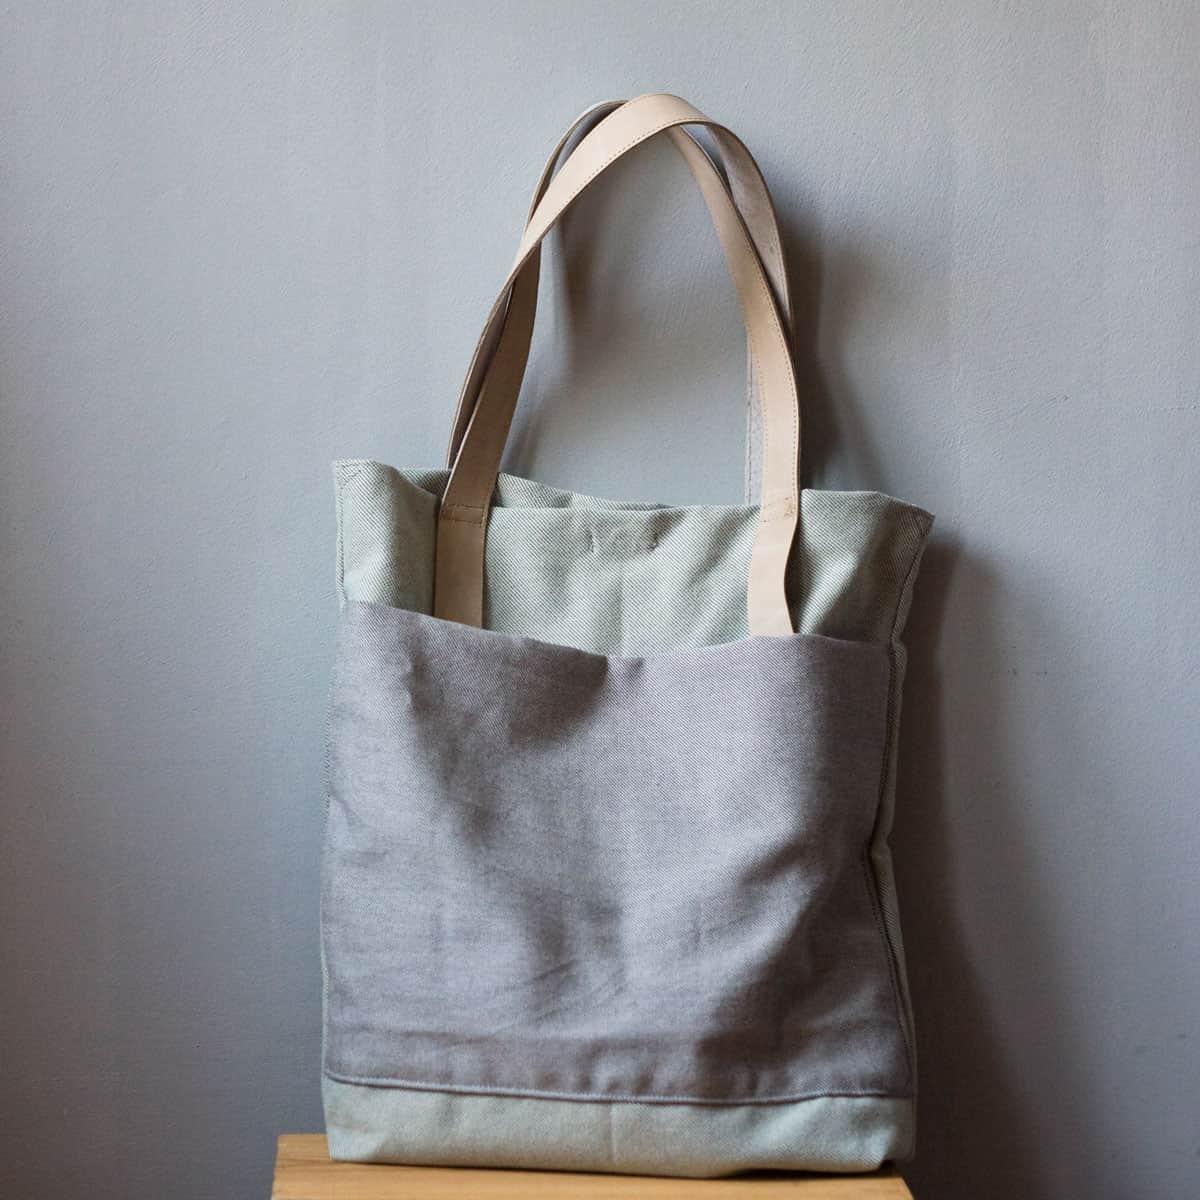 bawelniana-torba-kieszen1a